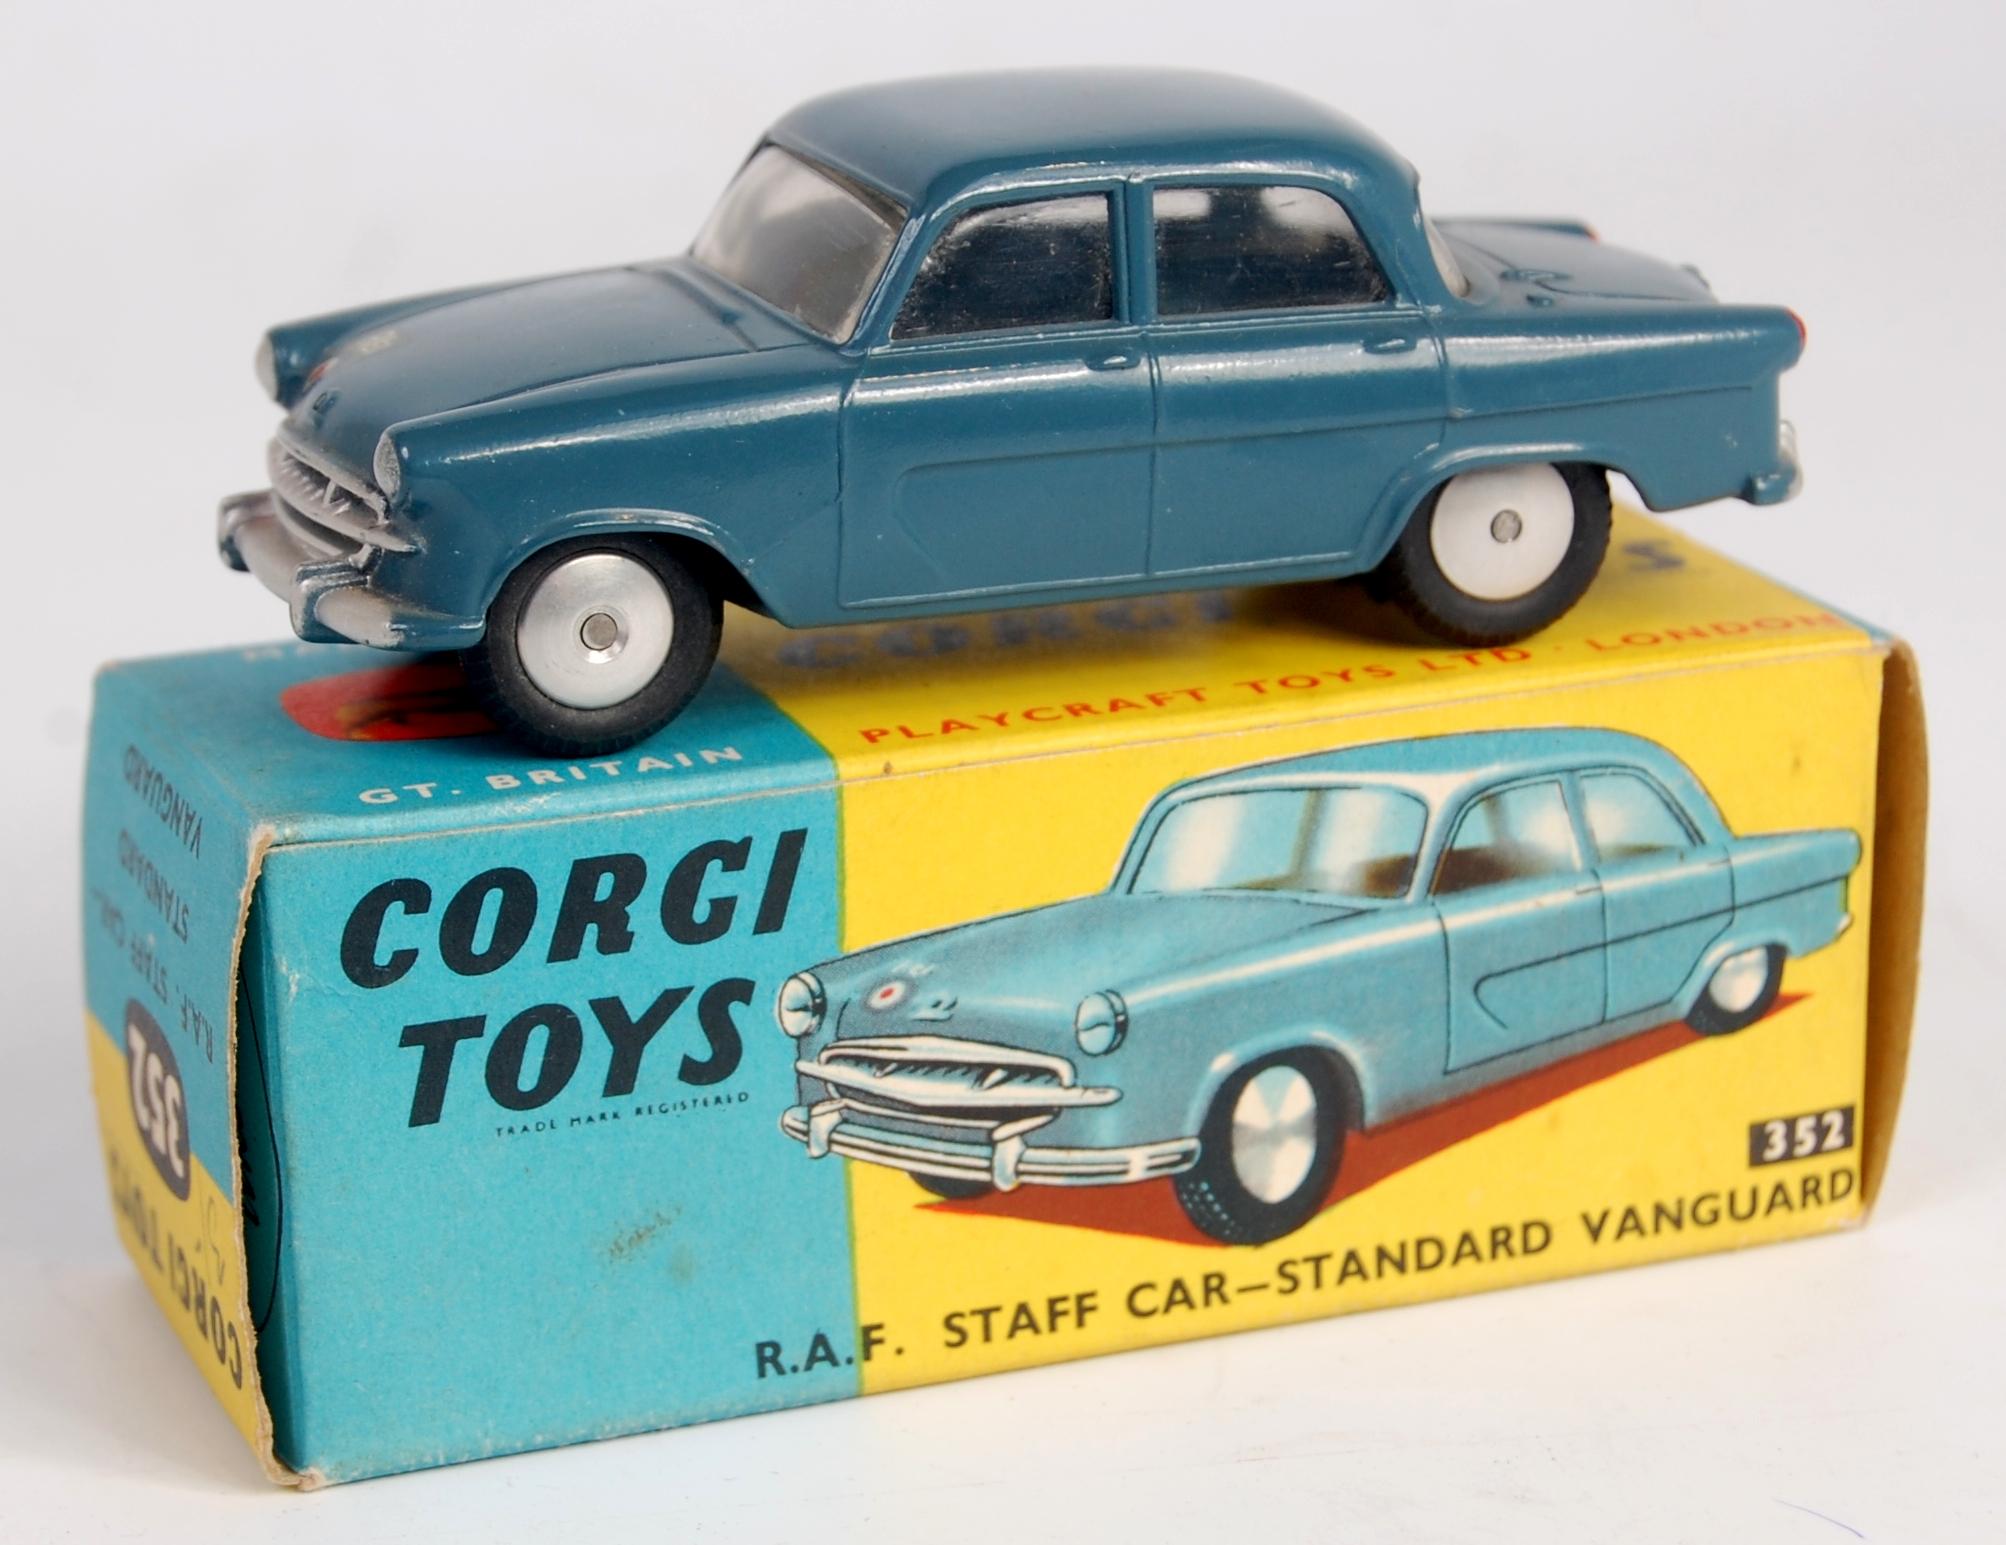 Corgi Toys, 352 RAF Standard Vanguard staff car, blue body with ...